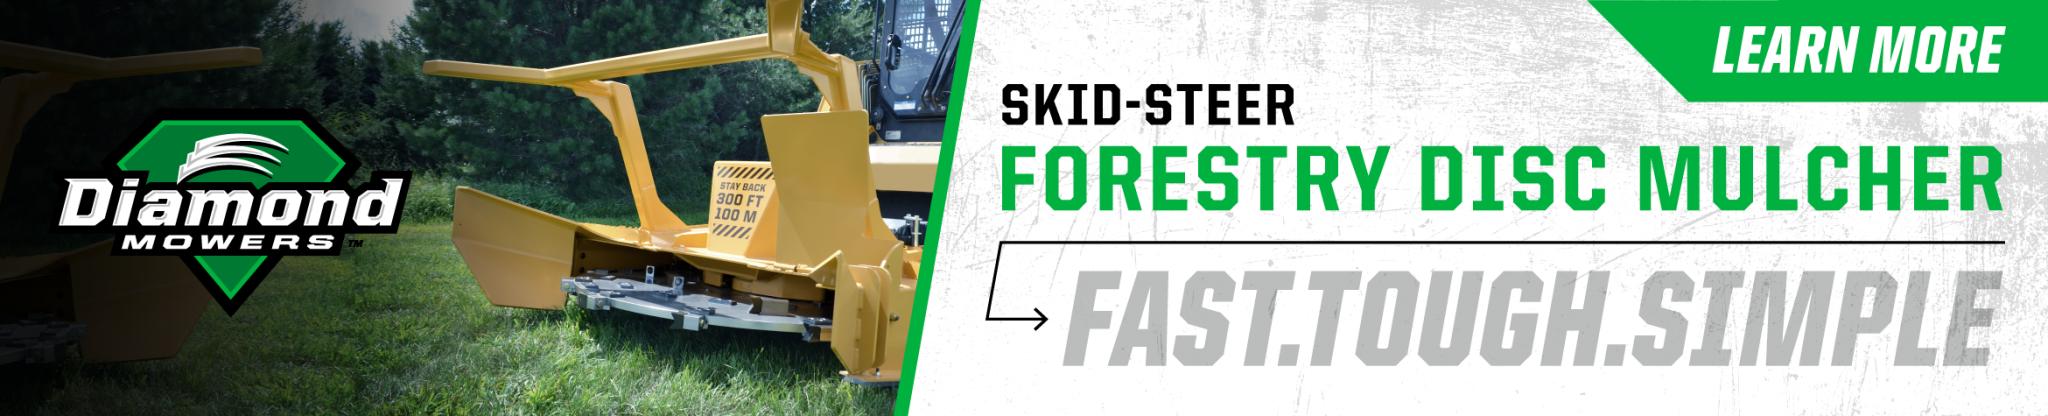 Diamond Mowers® – Tractor Mowers | Skid-Steer & Excavator Attachments